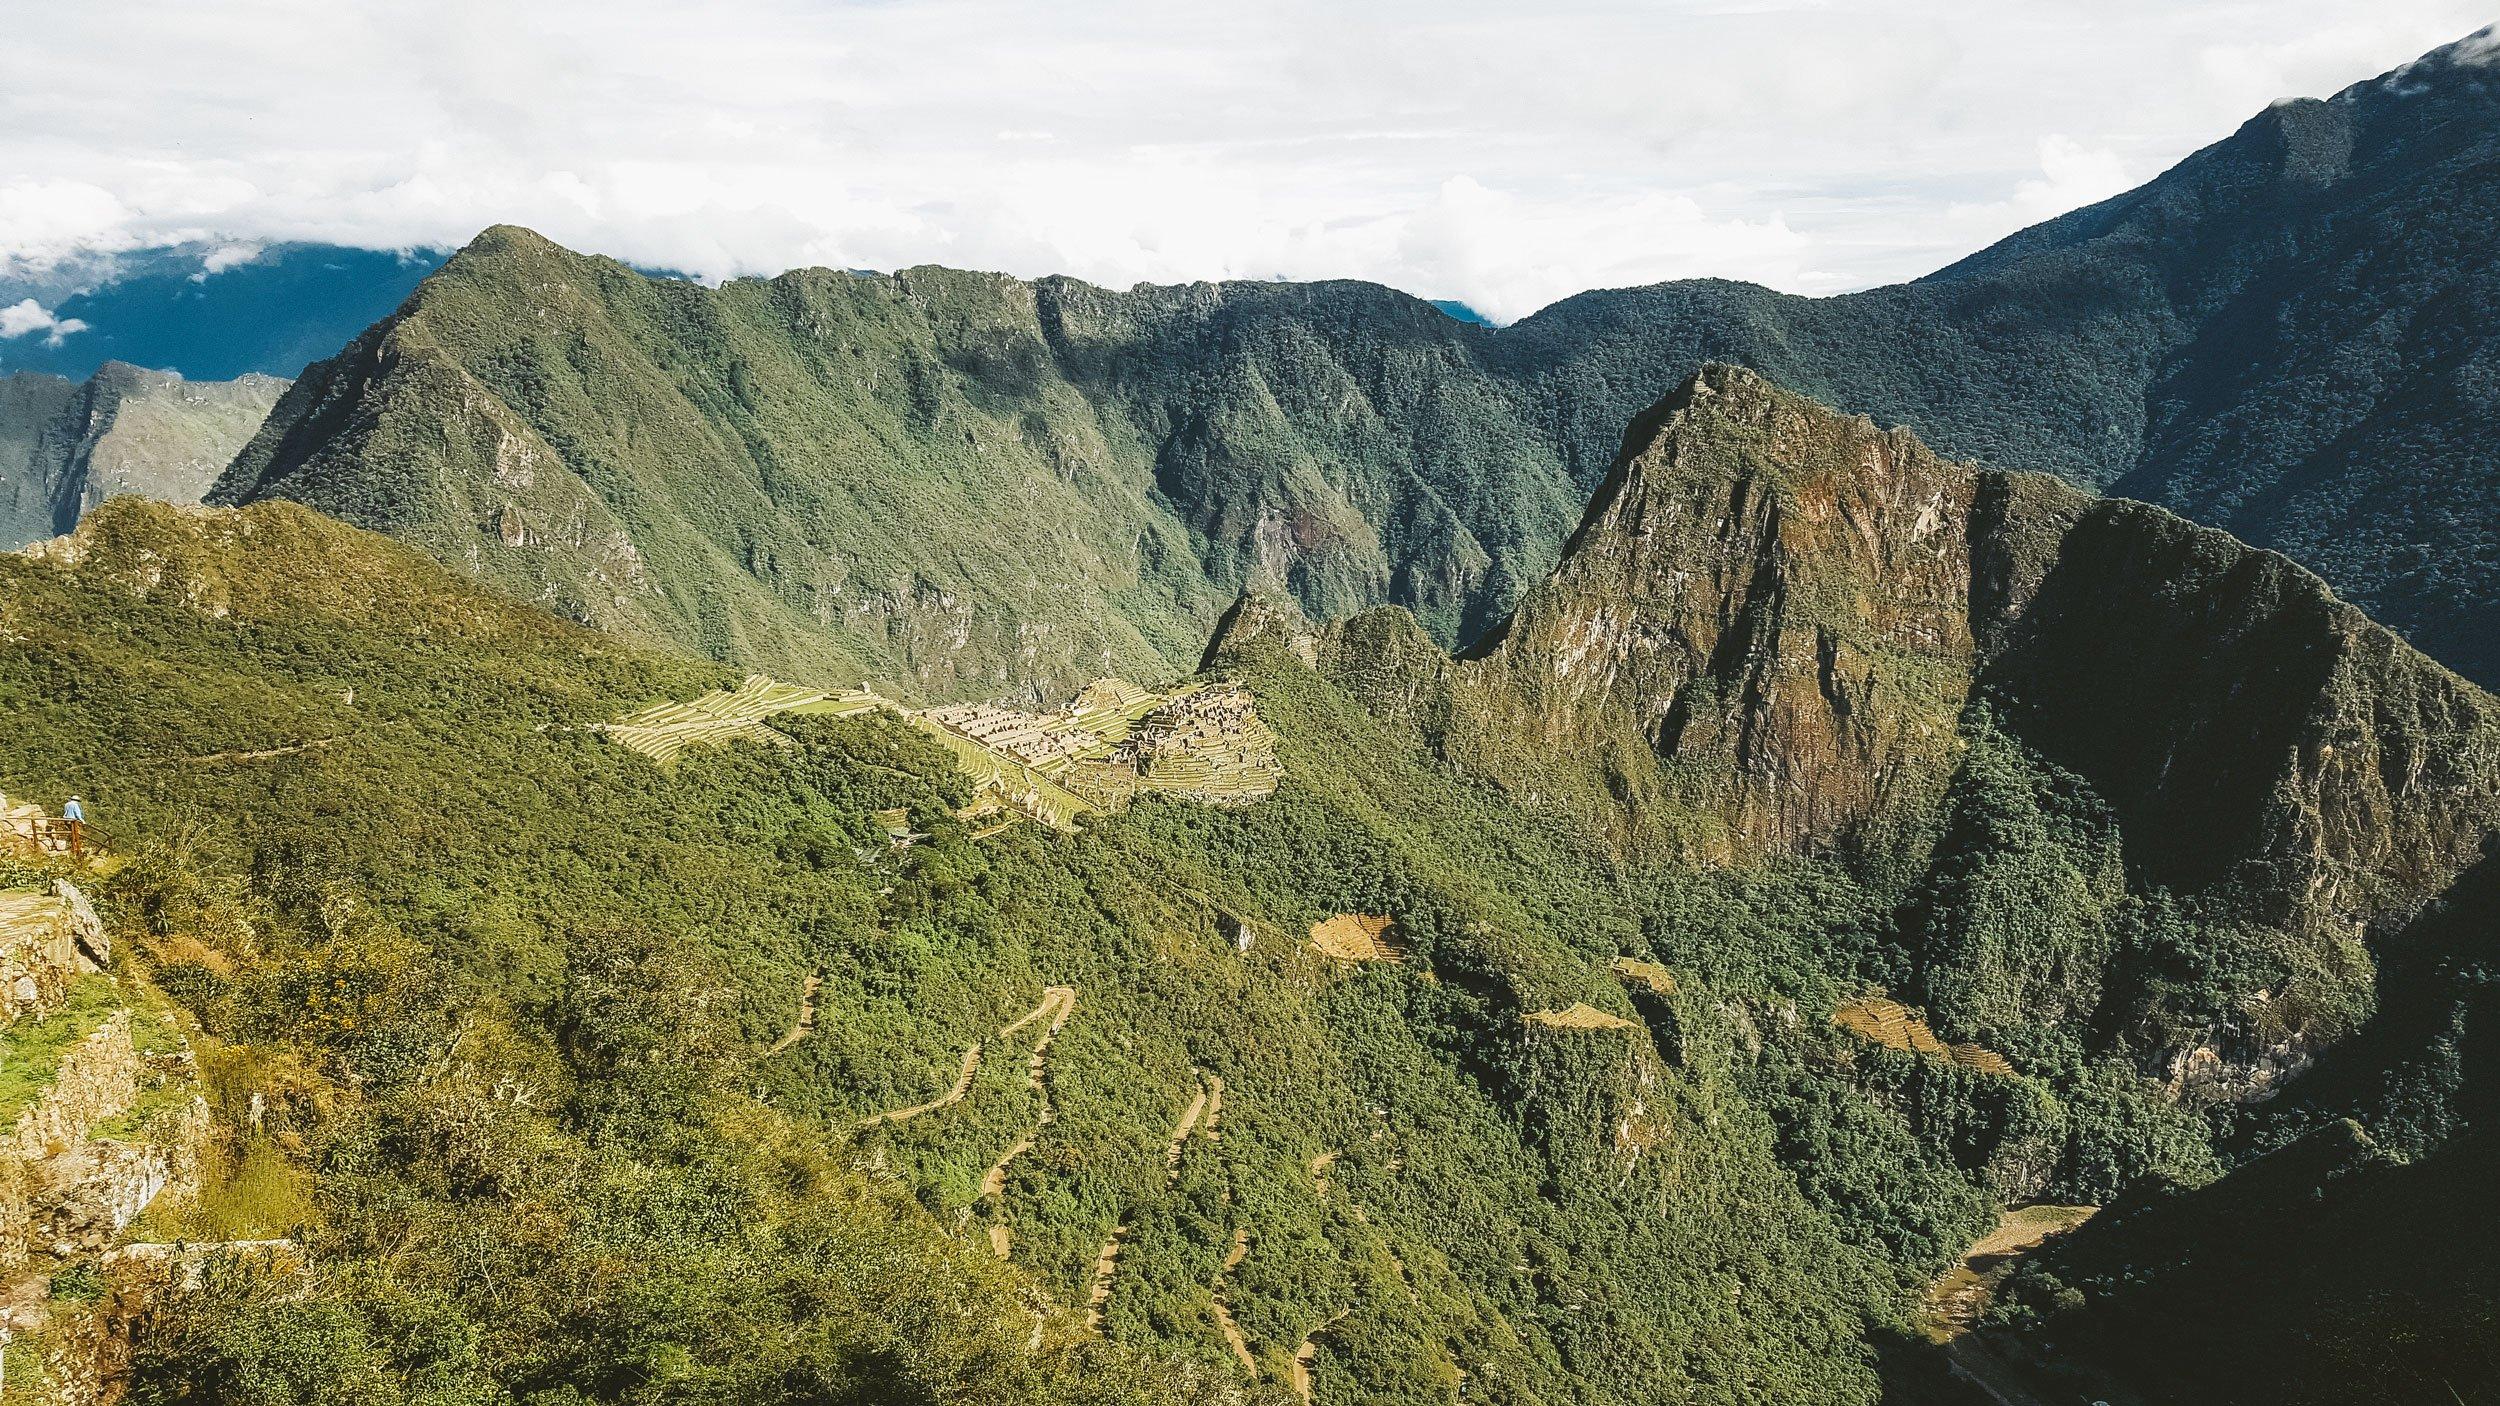 view from Intipunku Sun Gate at Machu Picchu | How to Hike the Inca Trail as a Solo Female Traveler